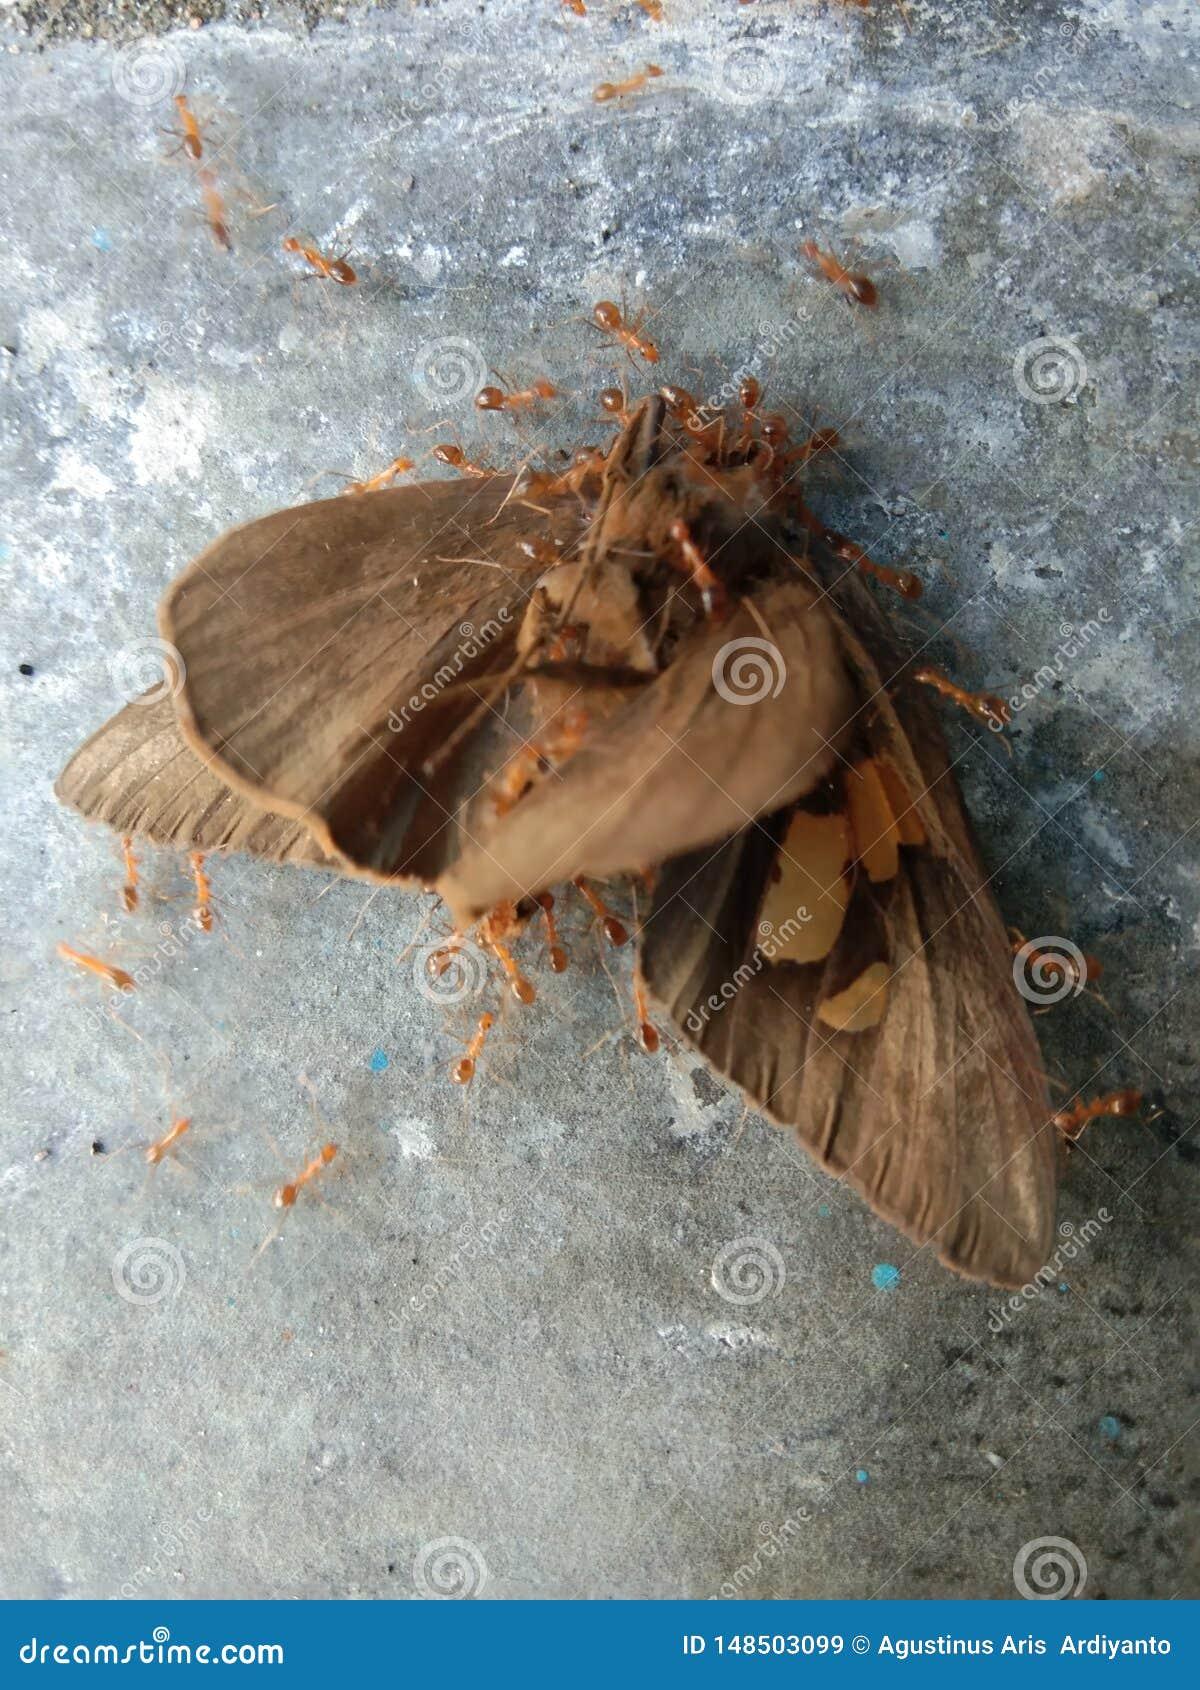 La mariposa invadió por la hormiga